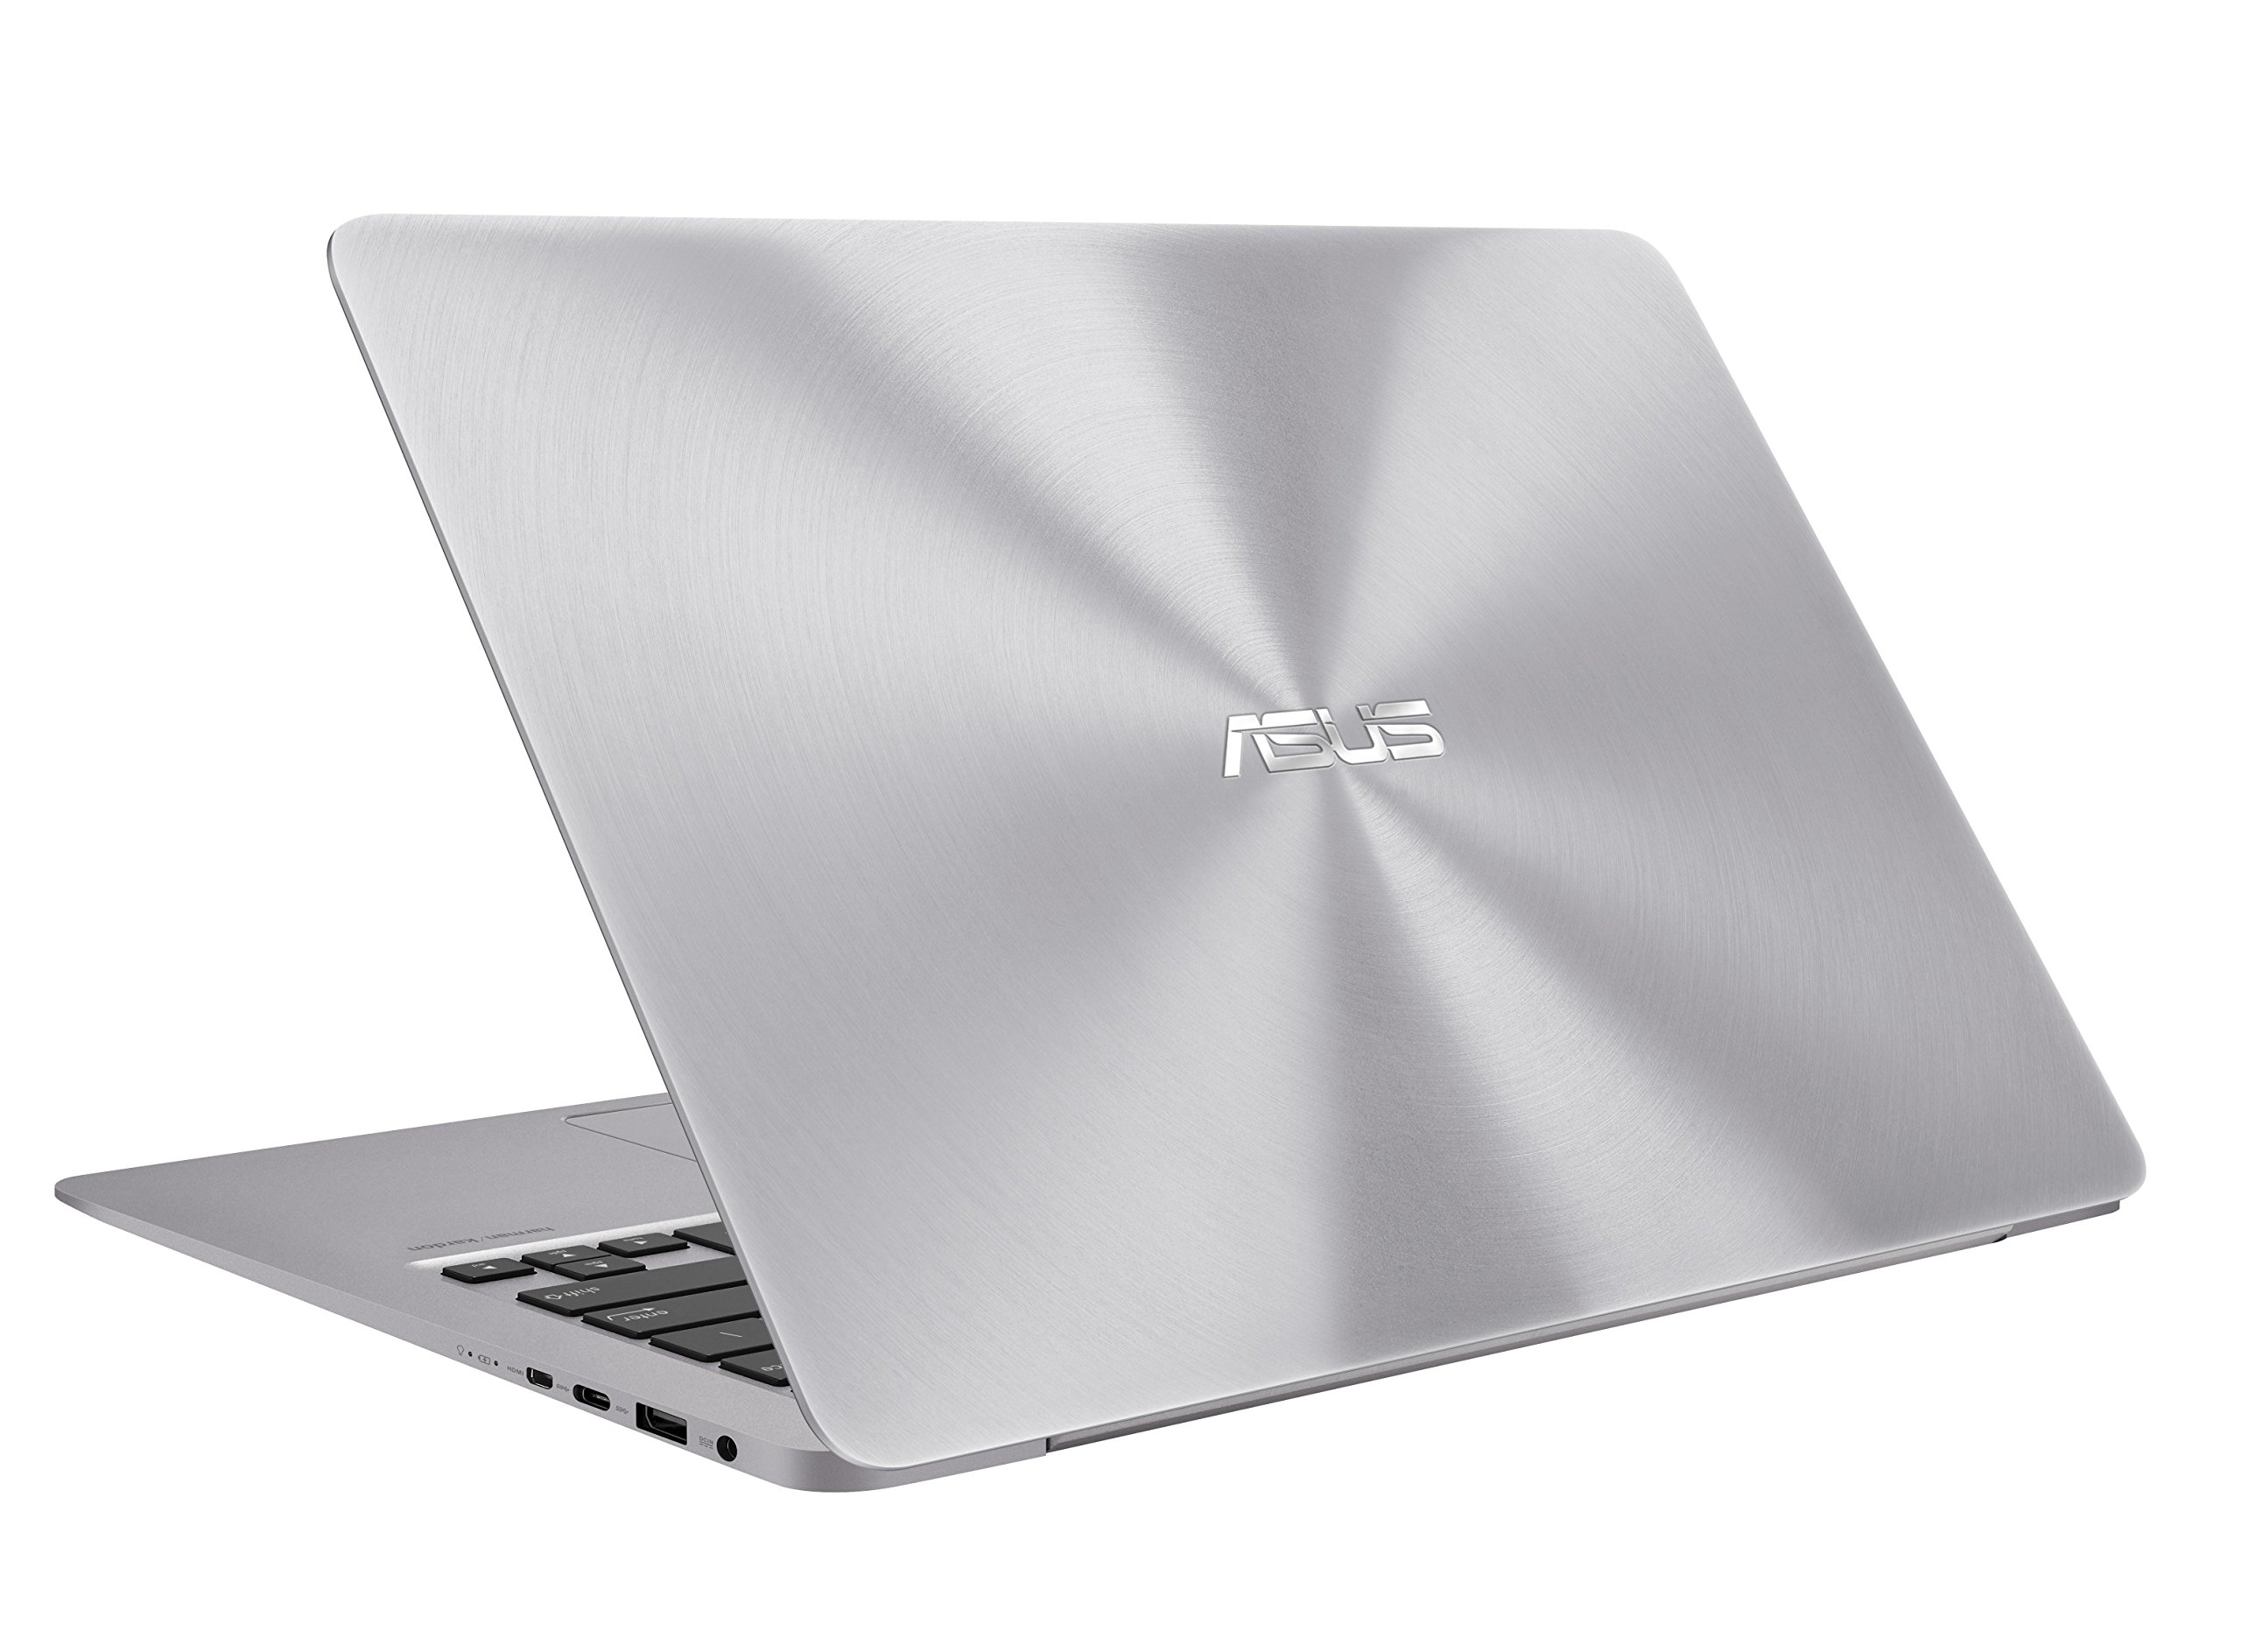 ASUS ZenBook UX330UA-AH54 13.3-inch LCD Ultra-Slim Laptop (Core i5 Processor, 8GB DDR3, 256GB SSD, Windows 10) w/ Harman Kardon Audio, Backlit keyboard, Fingerprint Reader by Asus (Image #2)